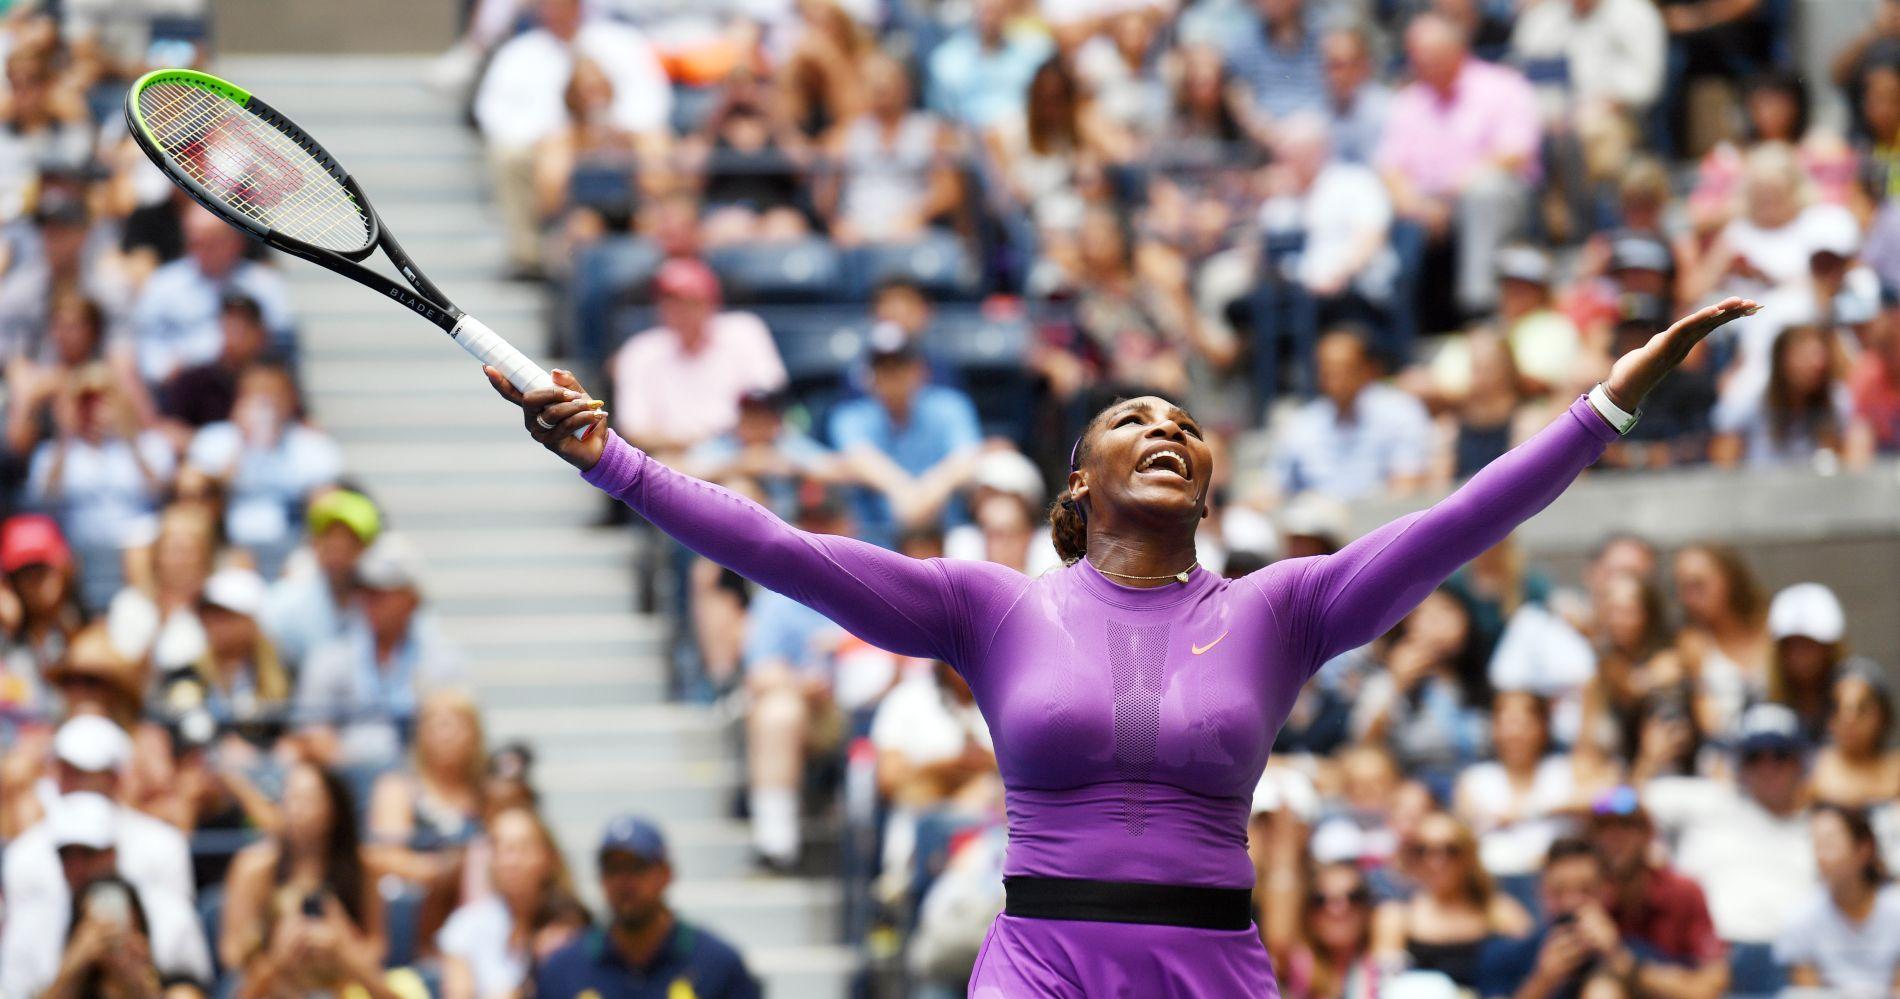 Serena Williams - Big crowd - US Open